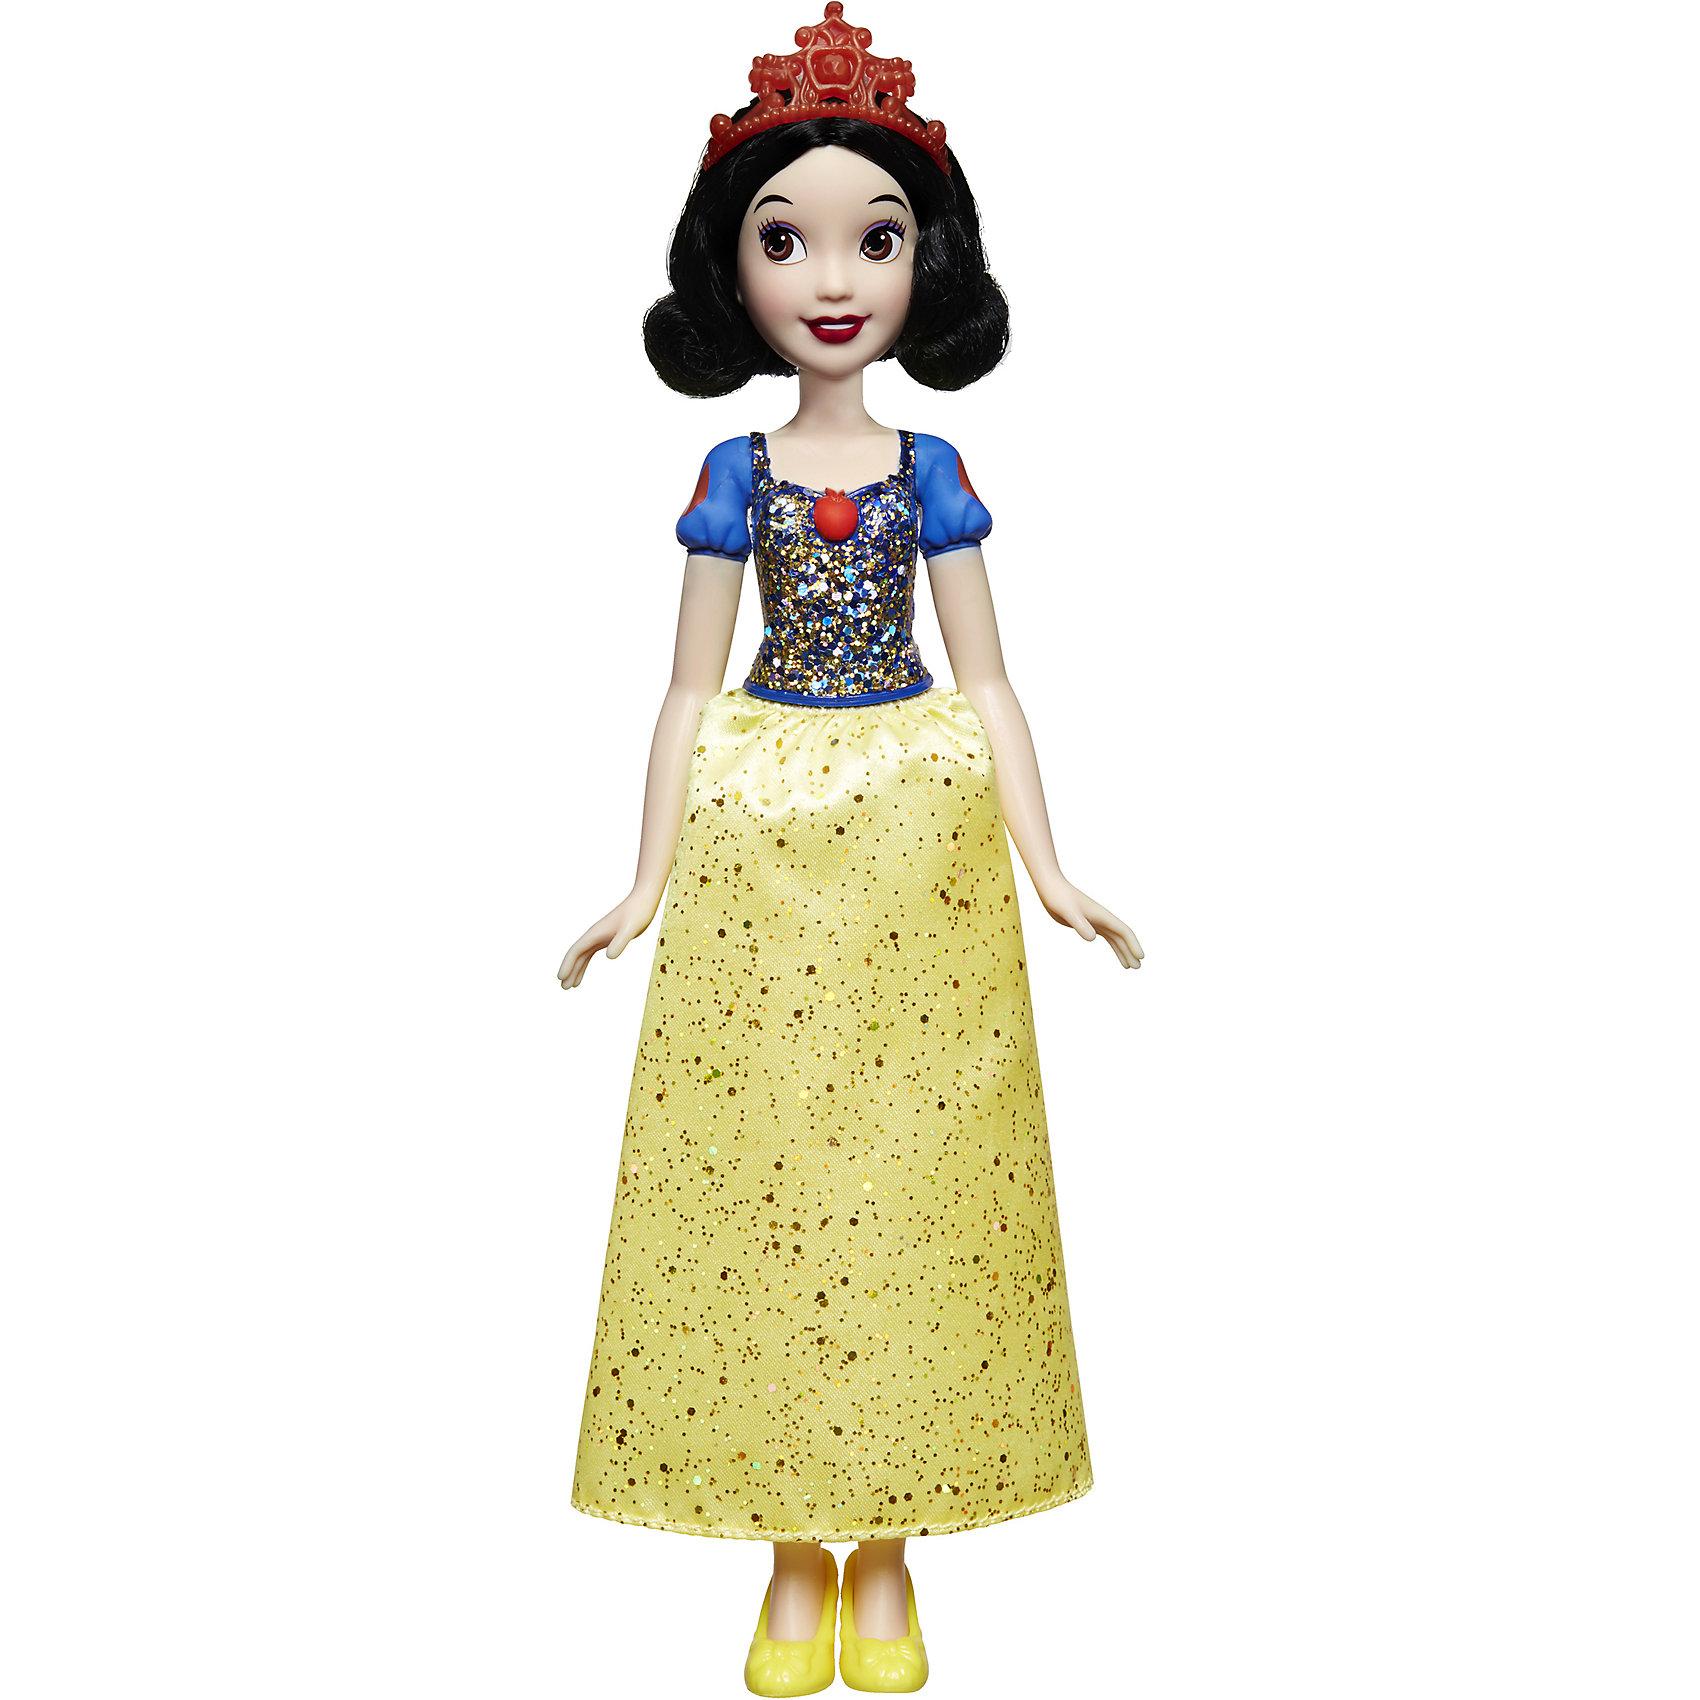 Hasbro Кукла Белоснежка, Принцессы Дисней кукла золушка 7 5 см принцессы дисней